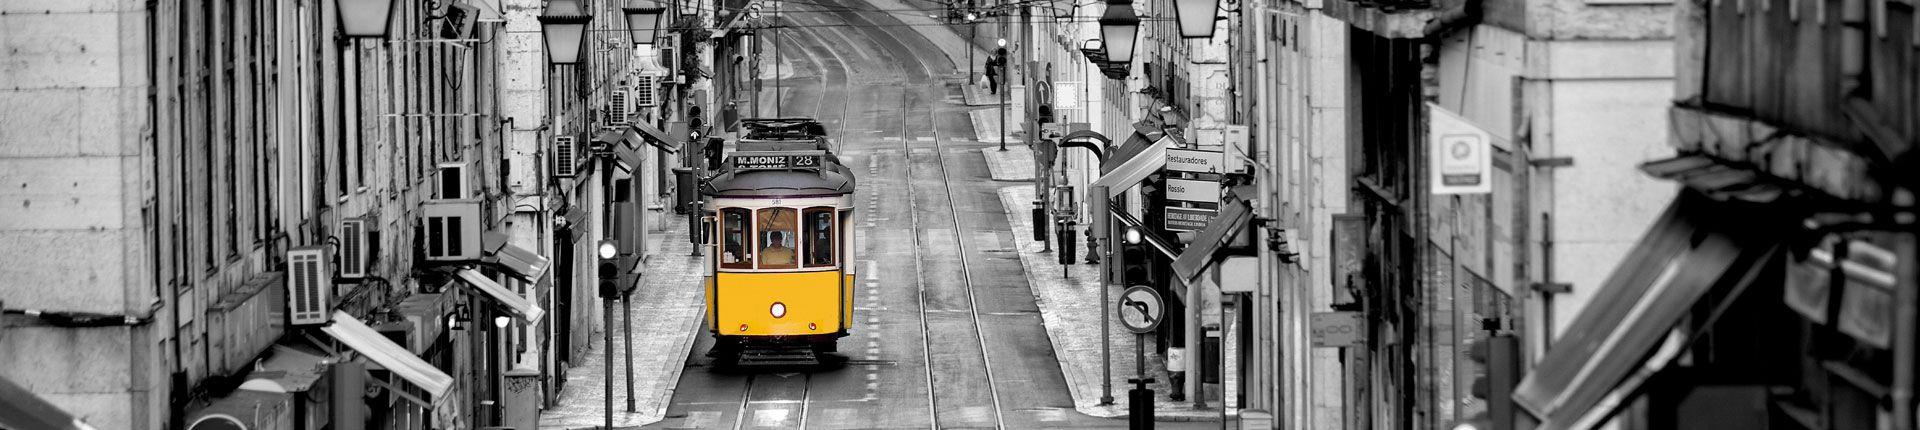 Appartamenti Lisbona Header Image